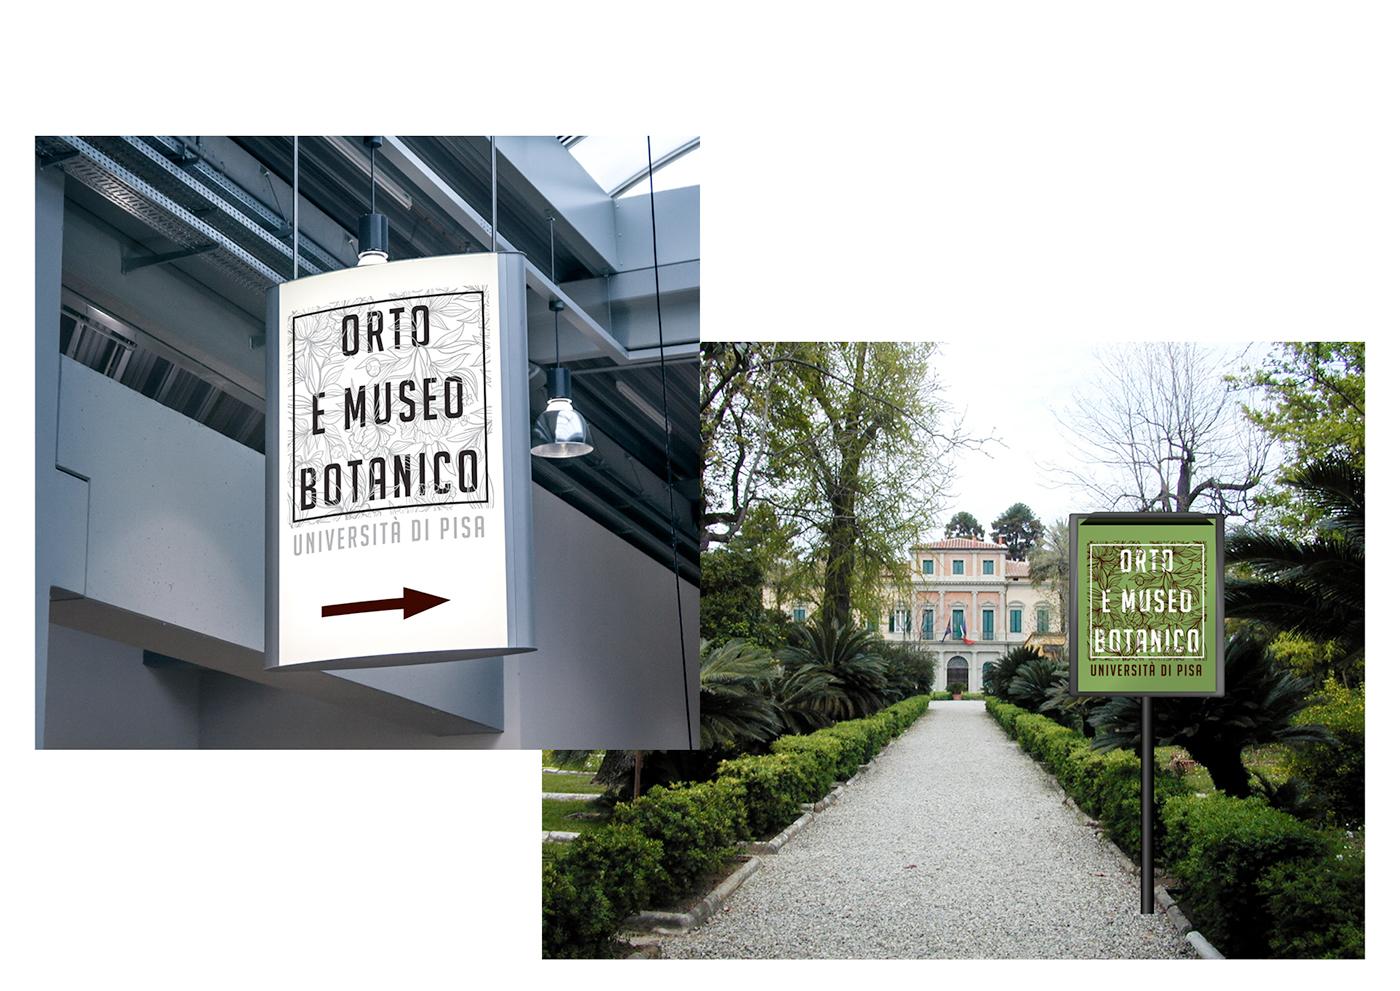 #orto #Logo #botanico #museo #brandidentidy #logotype  #garden #Museum #flower   #botanic